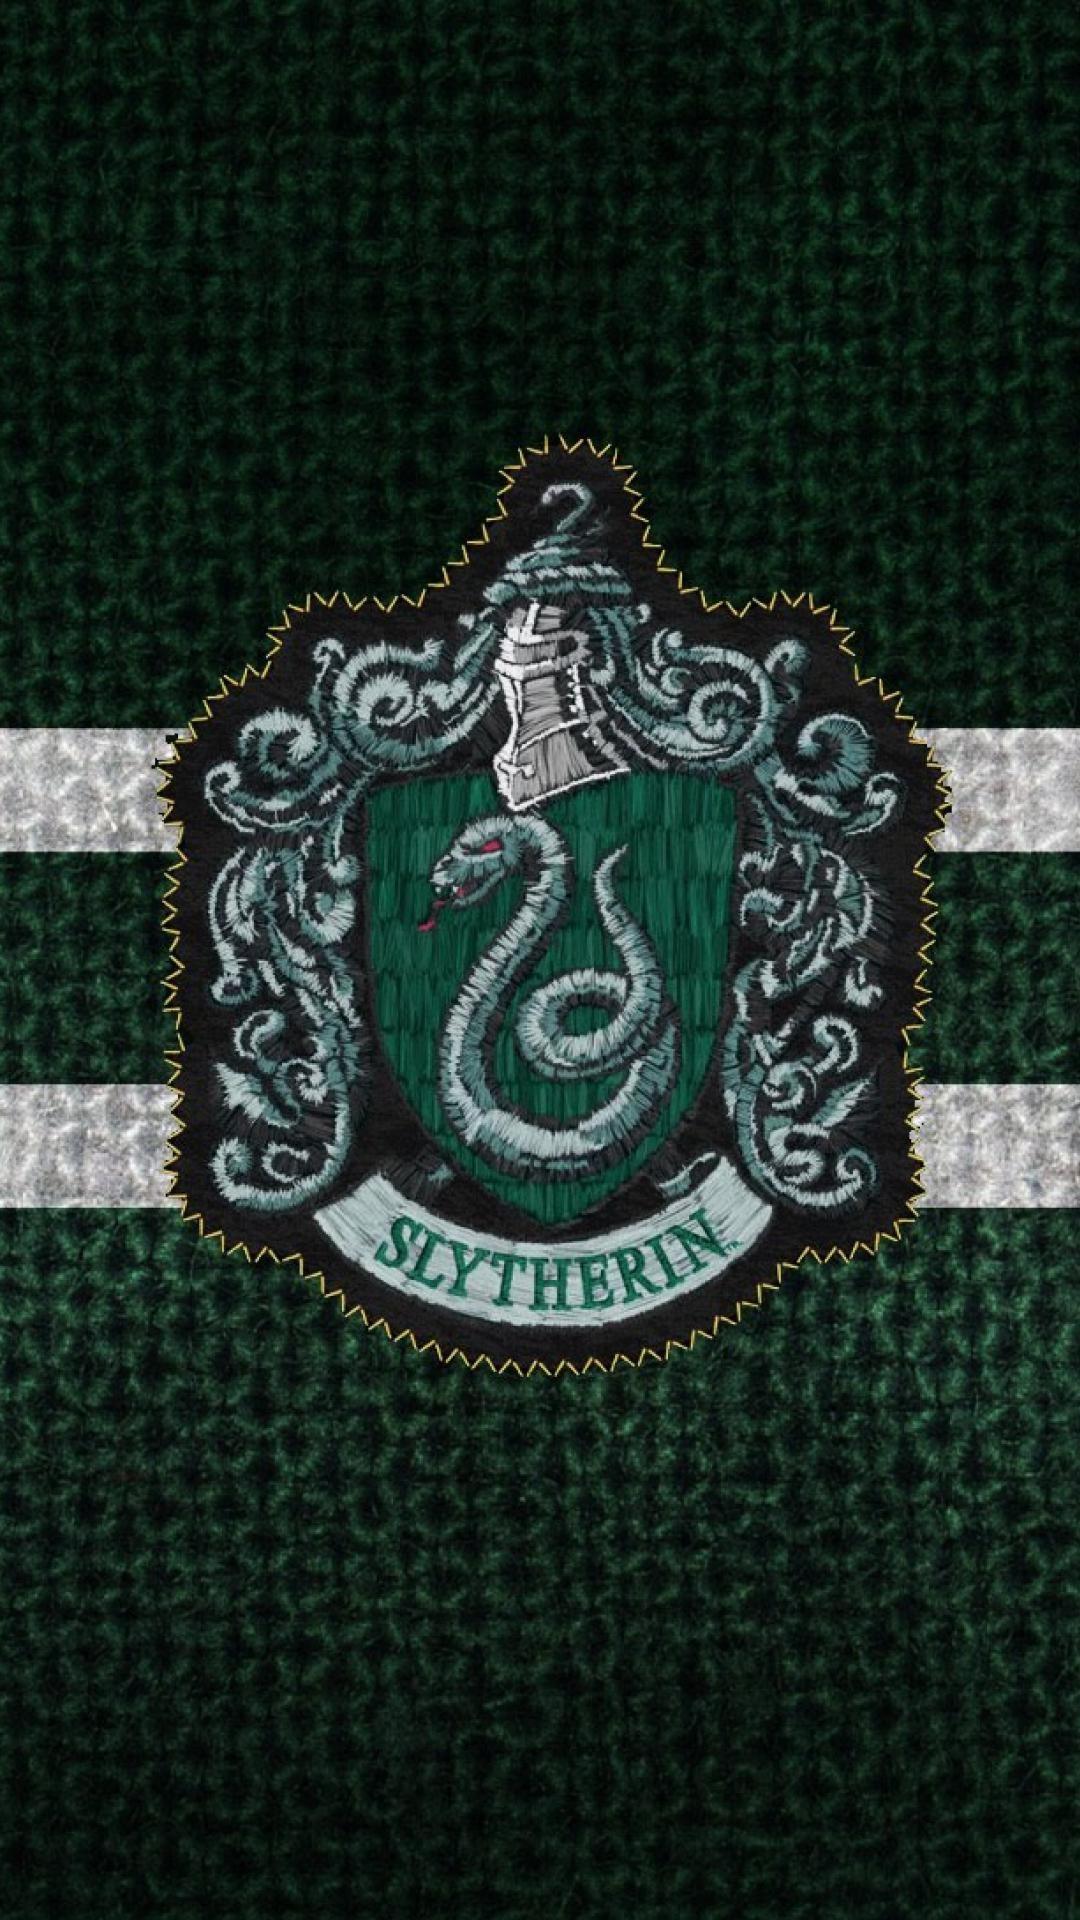 slytherin wallpapergreenemblemcappatternheadgear 1006019 1080x1920